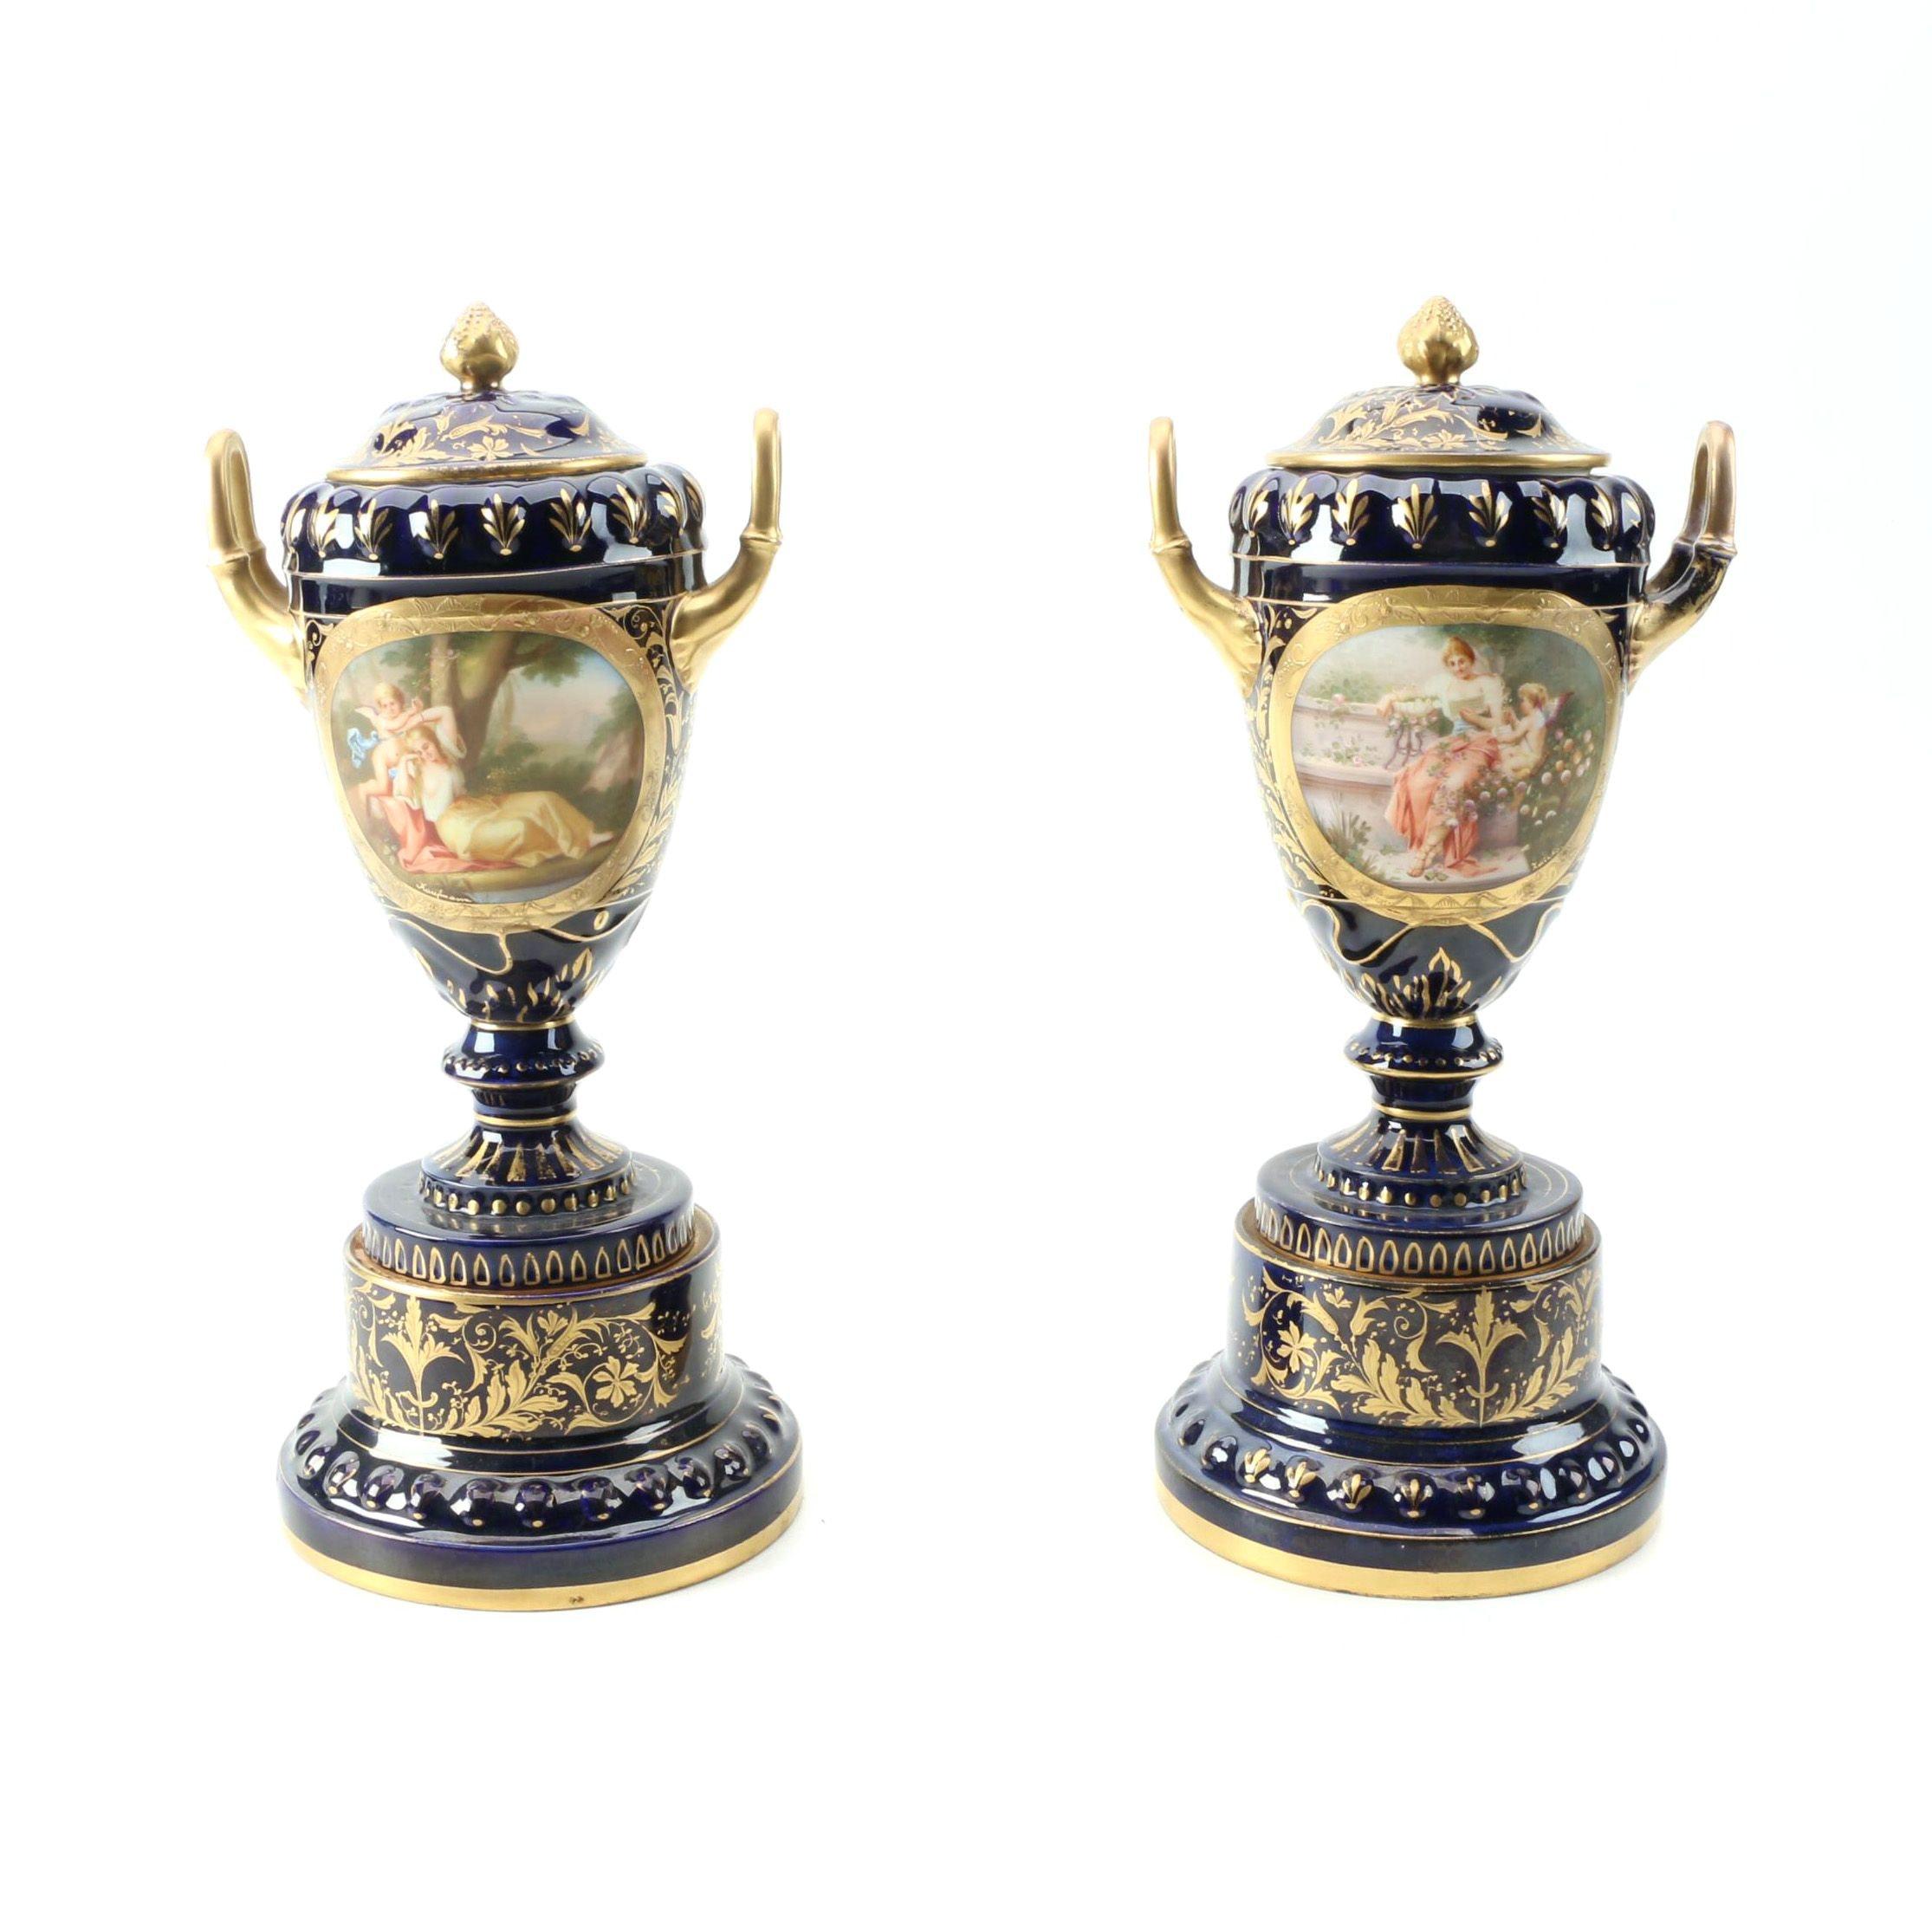 Ackermann and Fritze Royal Vienna Urns